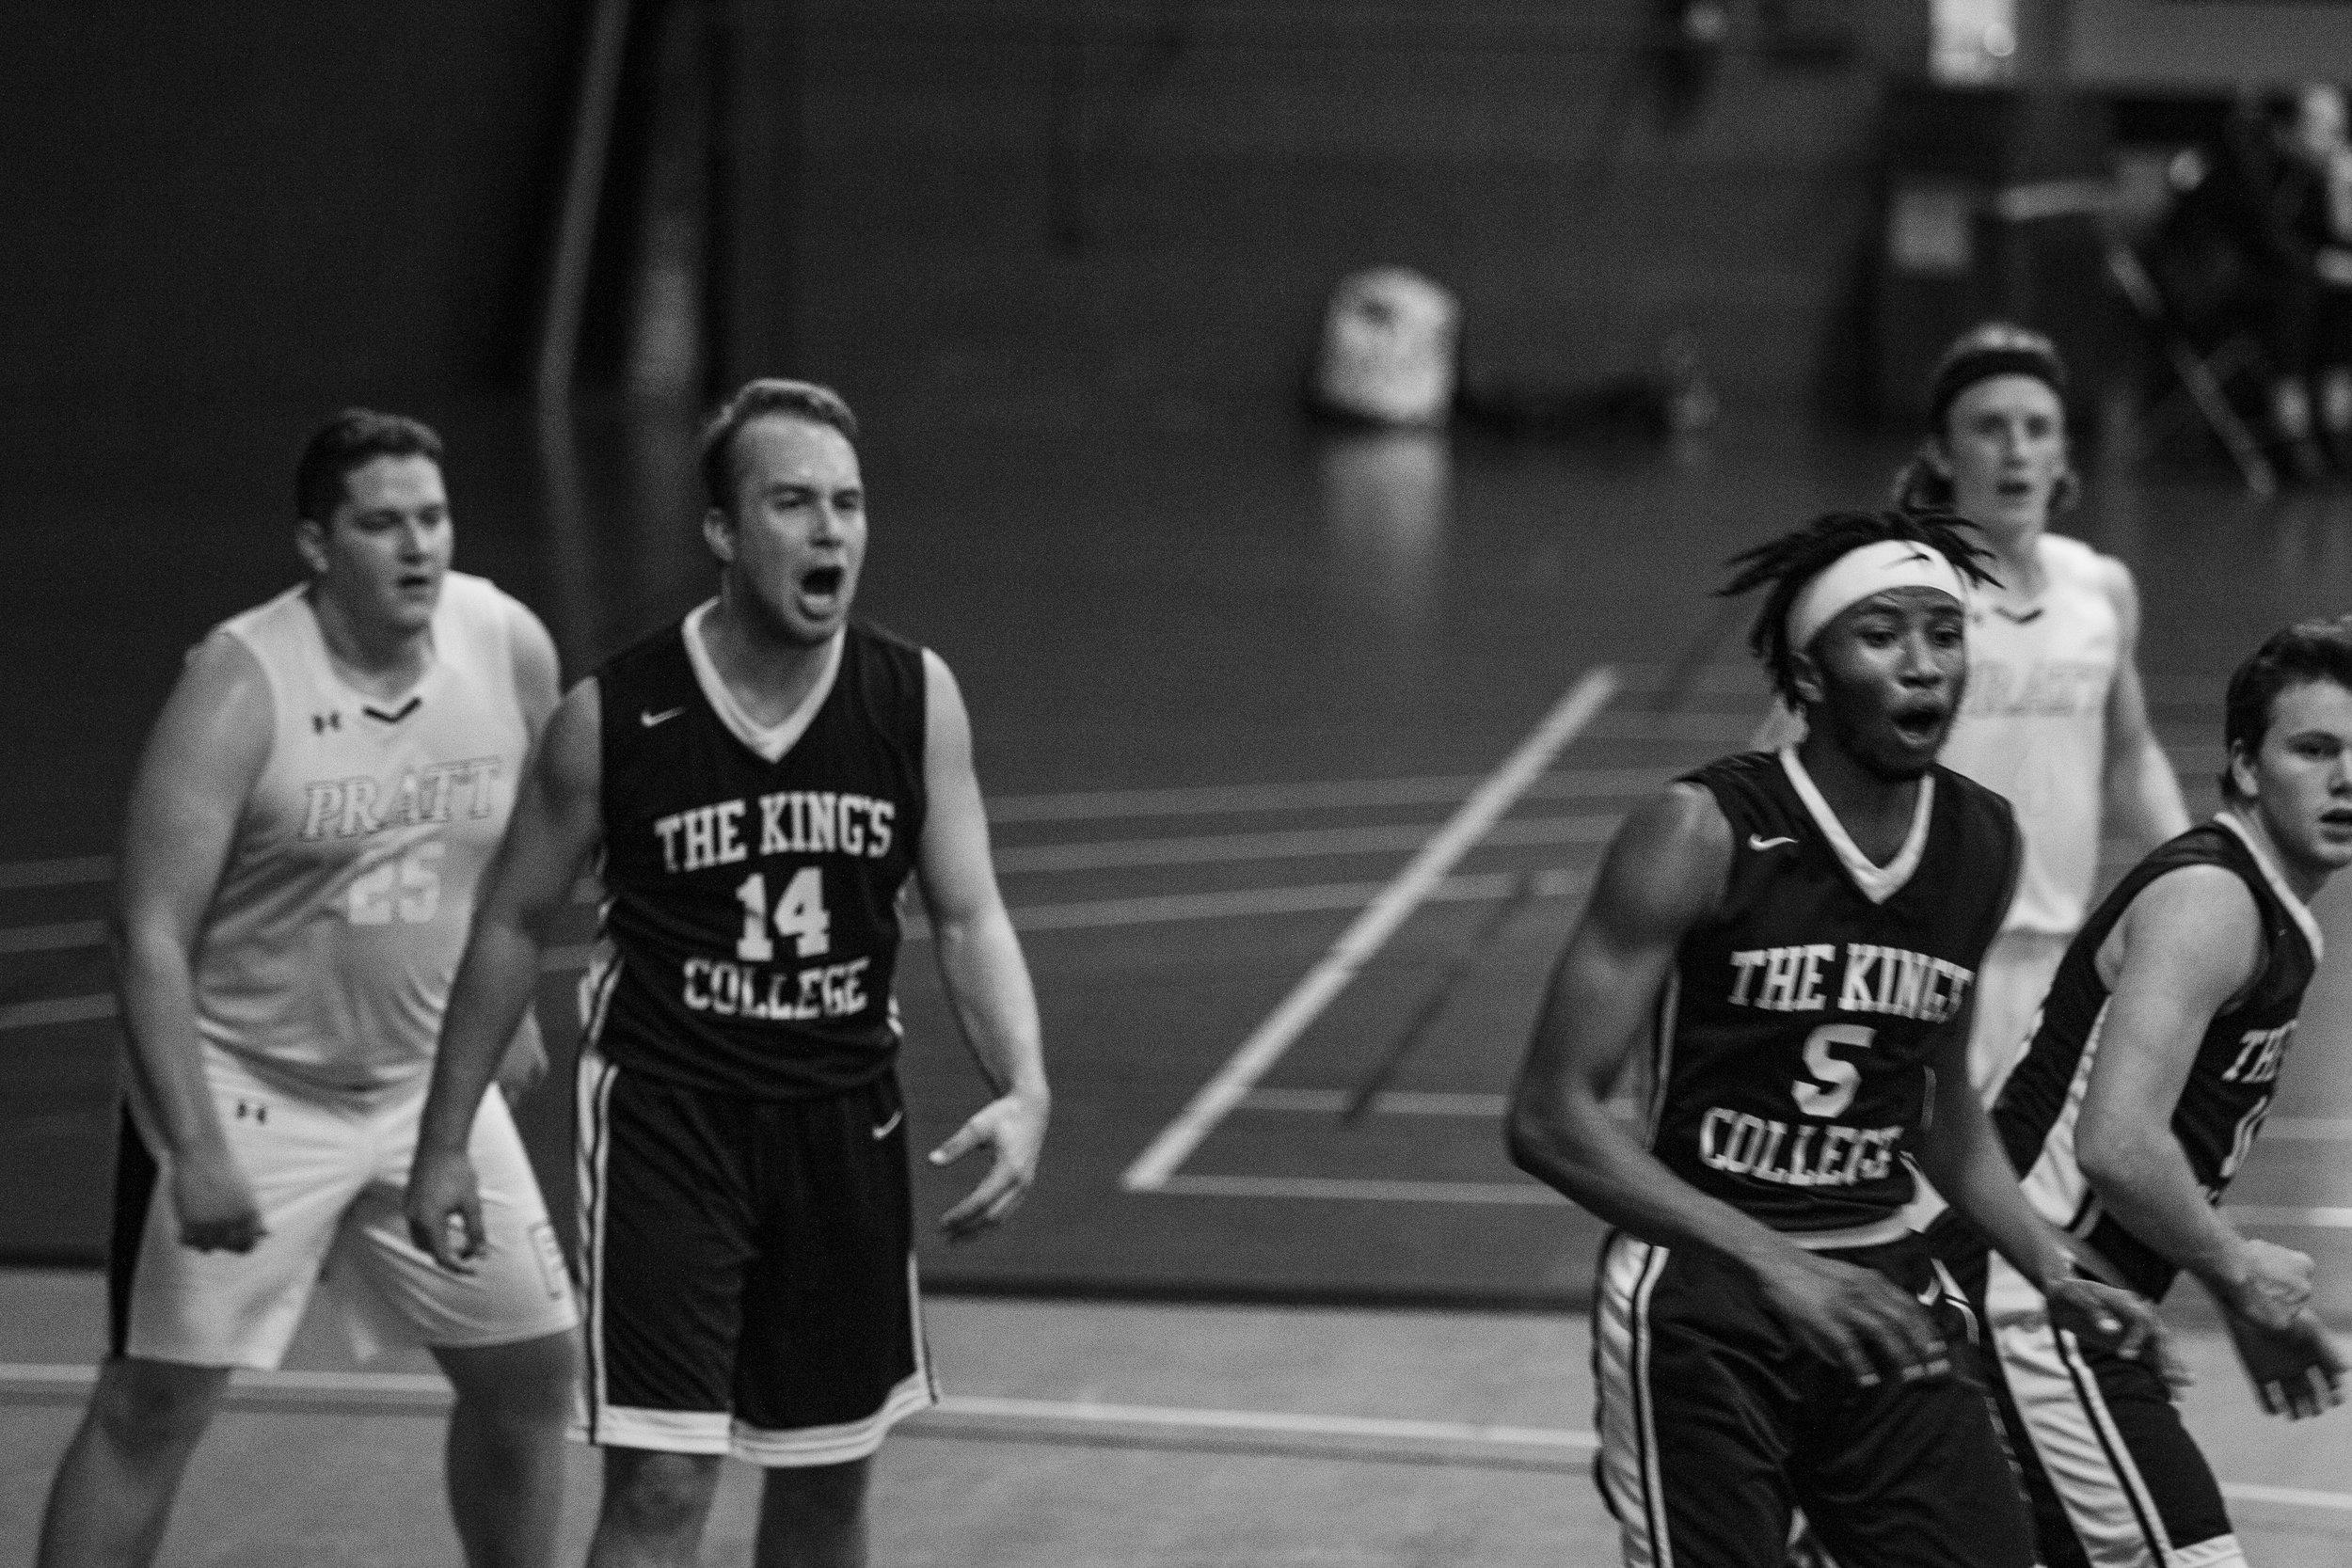 Senior Luke Borchelt in The King's College vs Pratt game in the 2017-2018 season || Photo Credits Bernadette Berdychowski